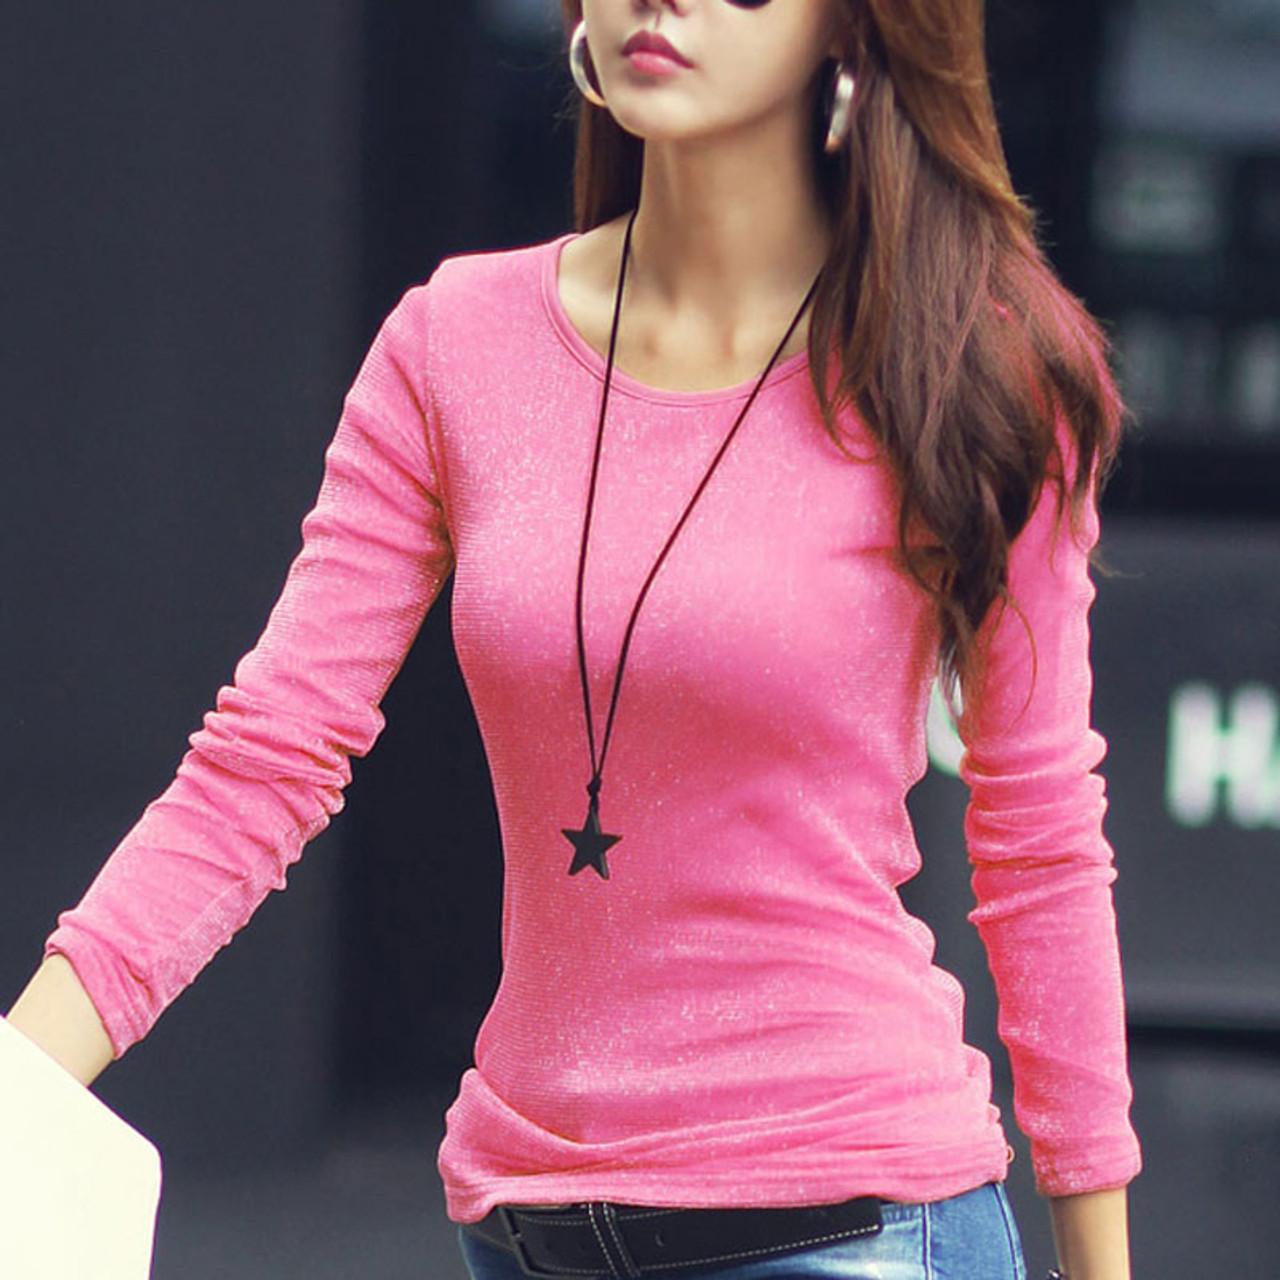 89f2f4260e32 ... VOLOCEAN 2018 New Blinking Tshirt Women Shiny T-shirts For Women  Fashion Long-sleeve ...